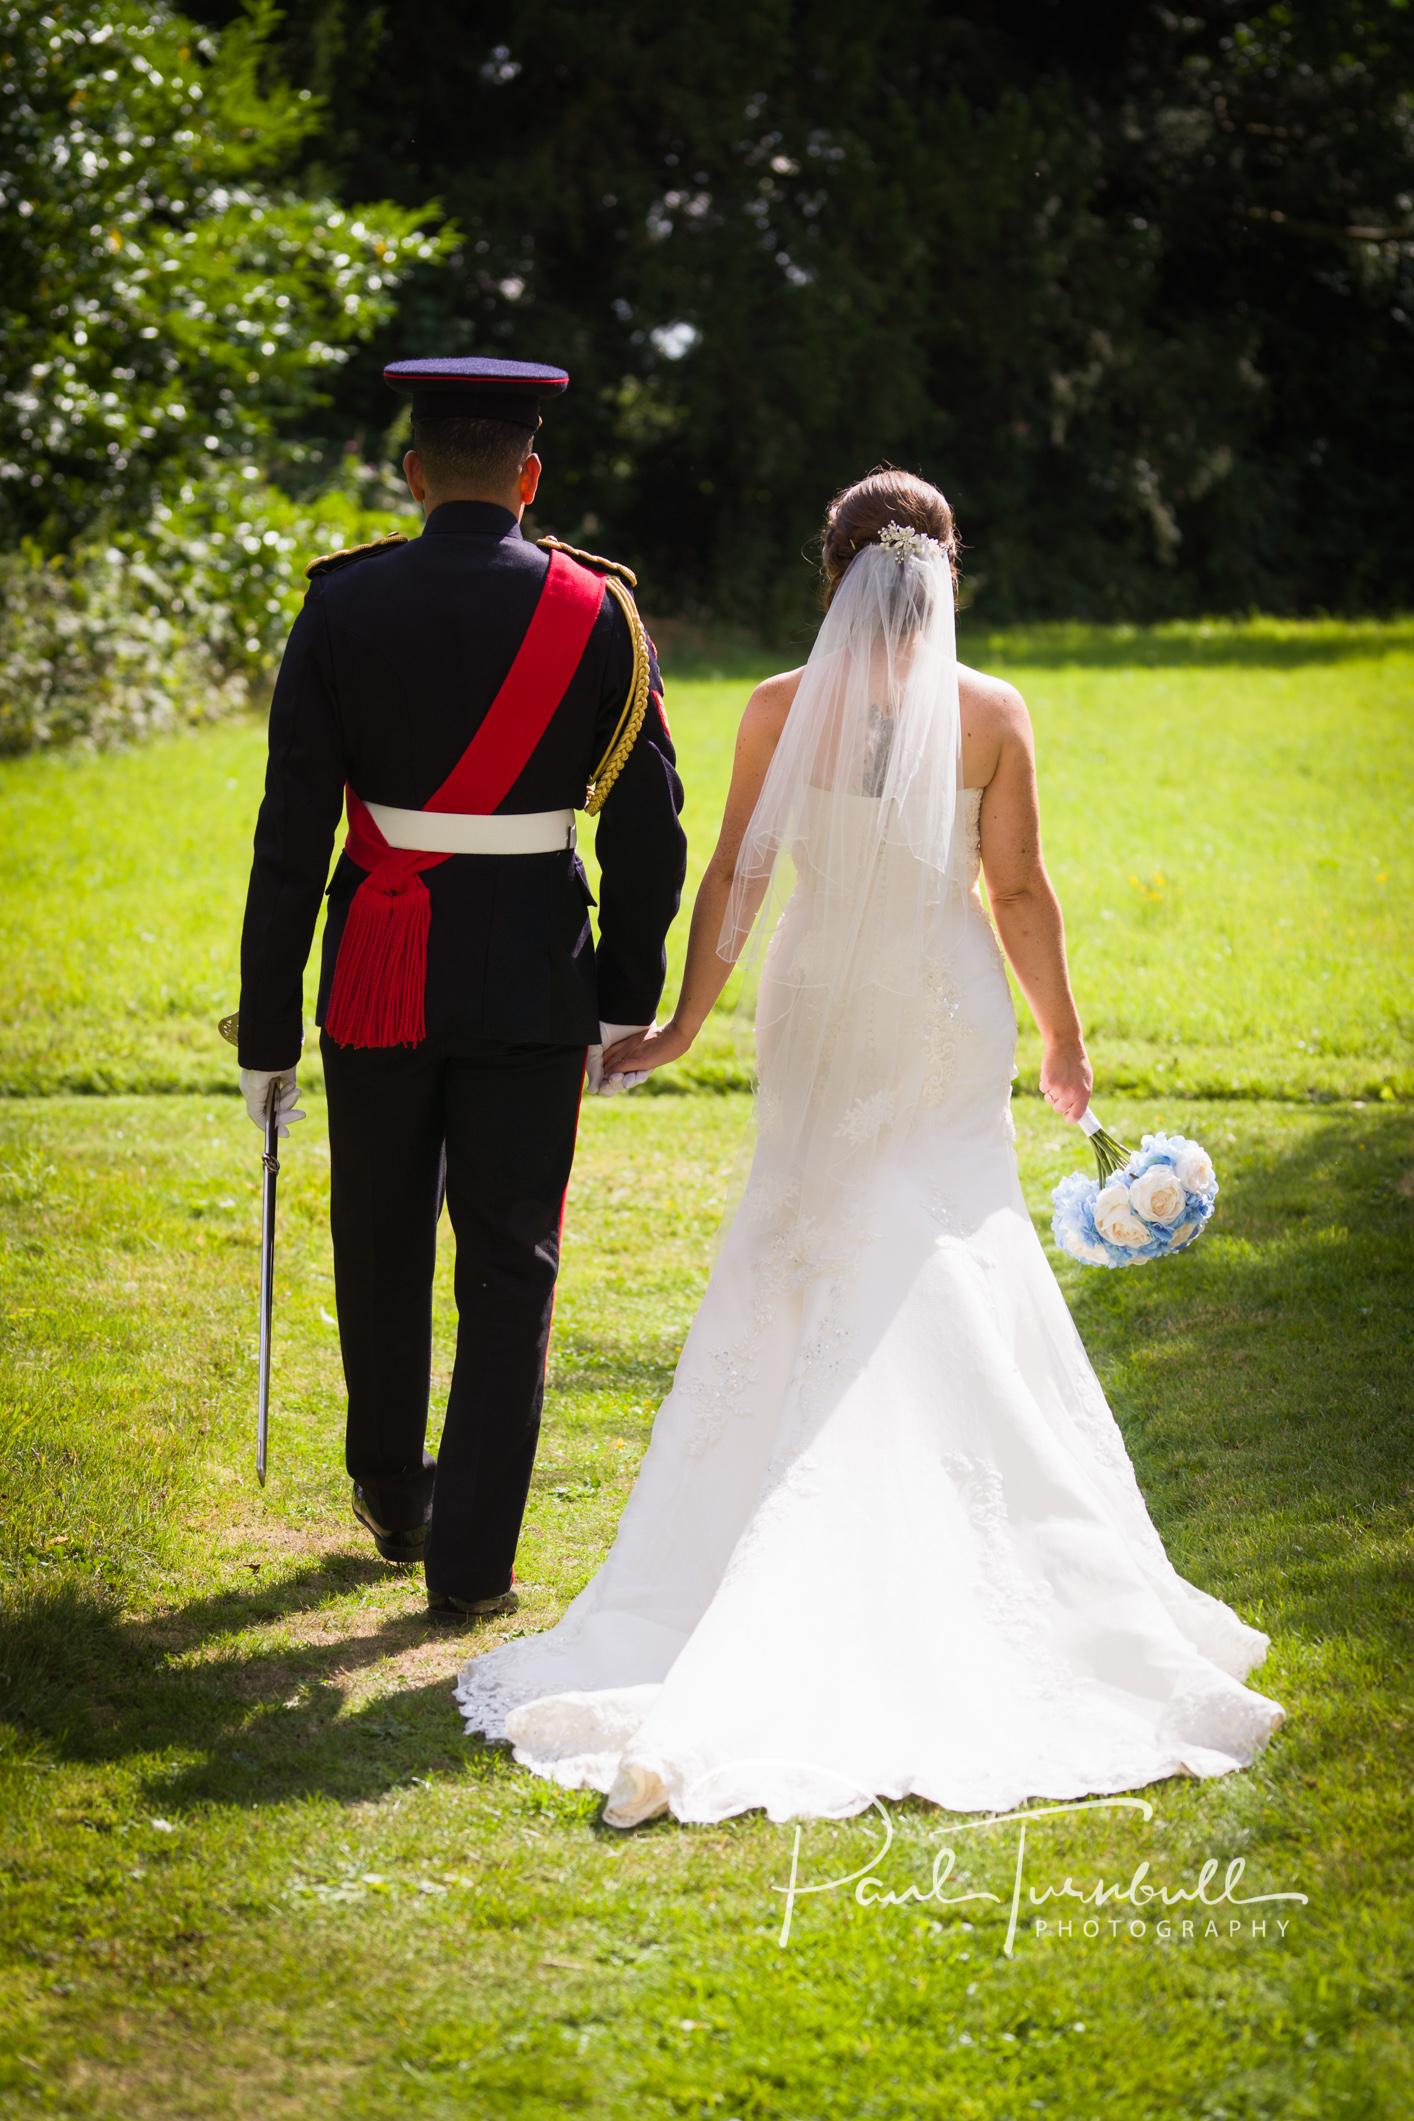 wedding-photographer-south-dalton-walkington-yorkshire-emma-james-040.jpg